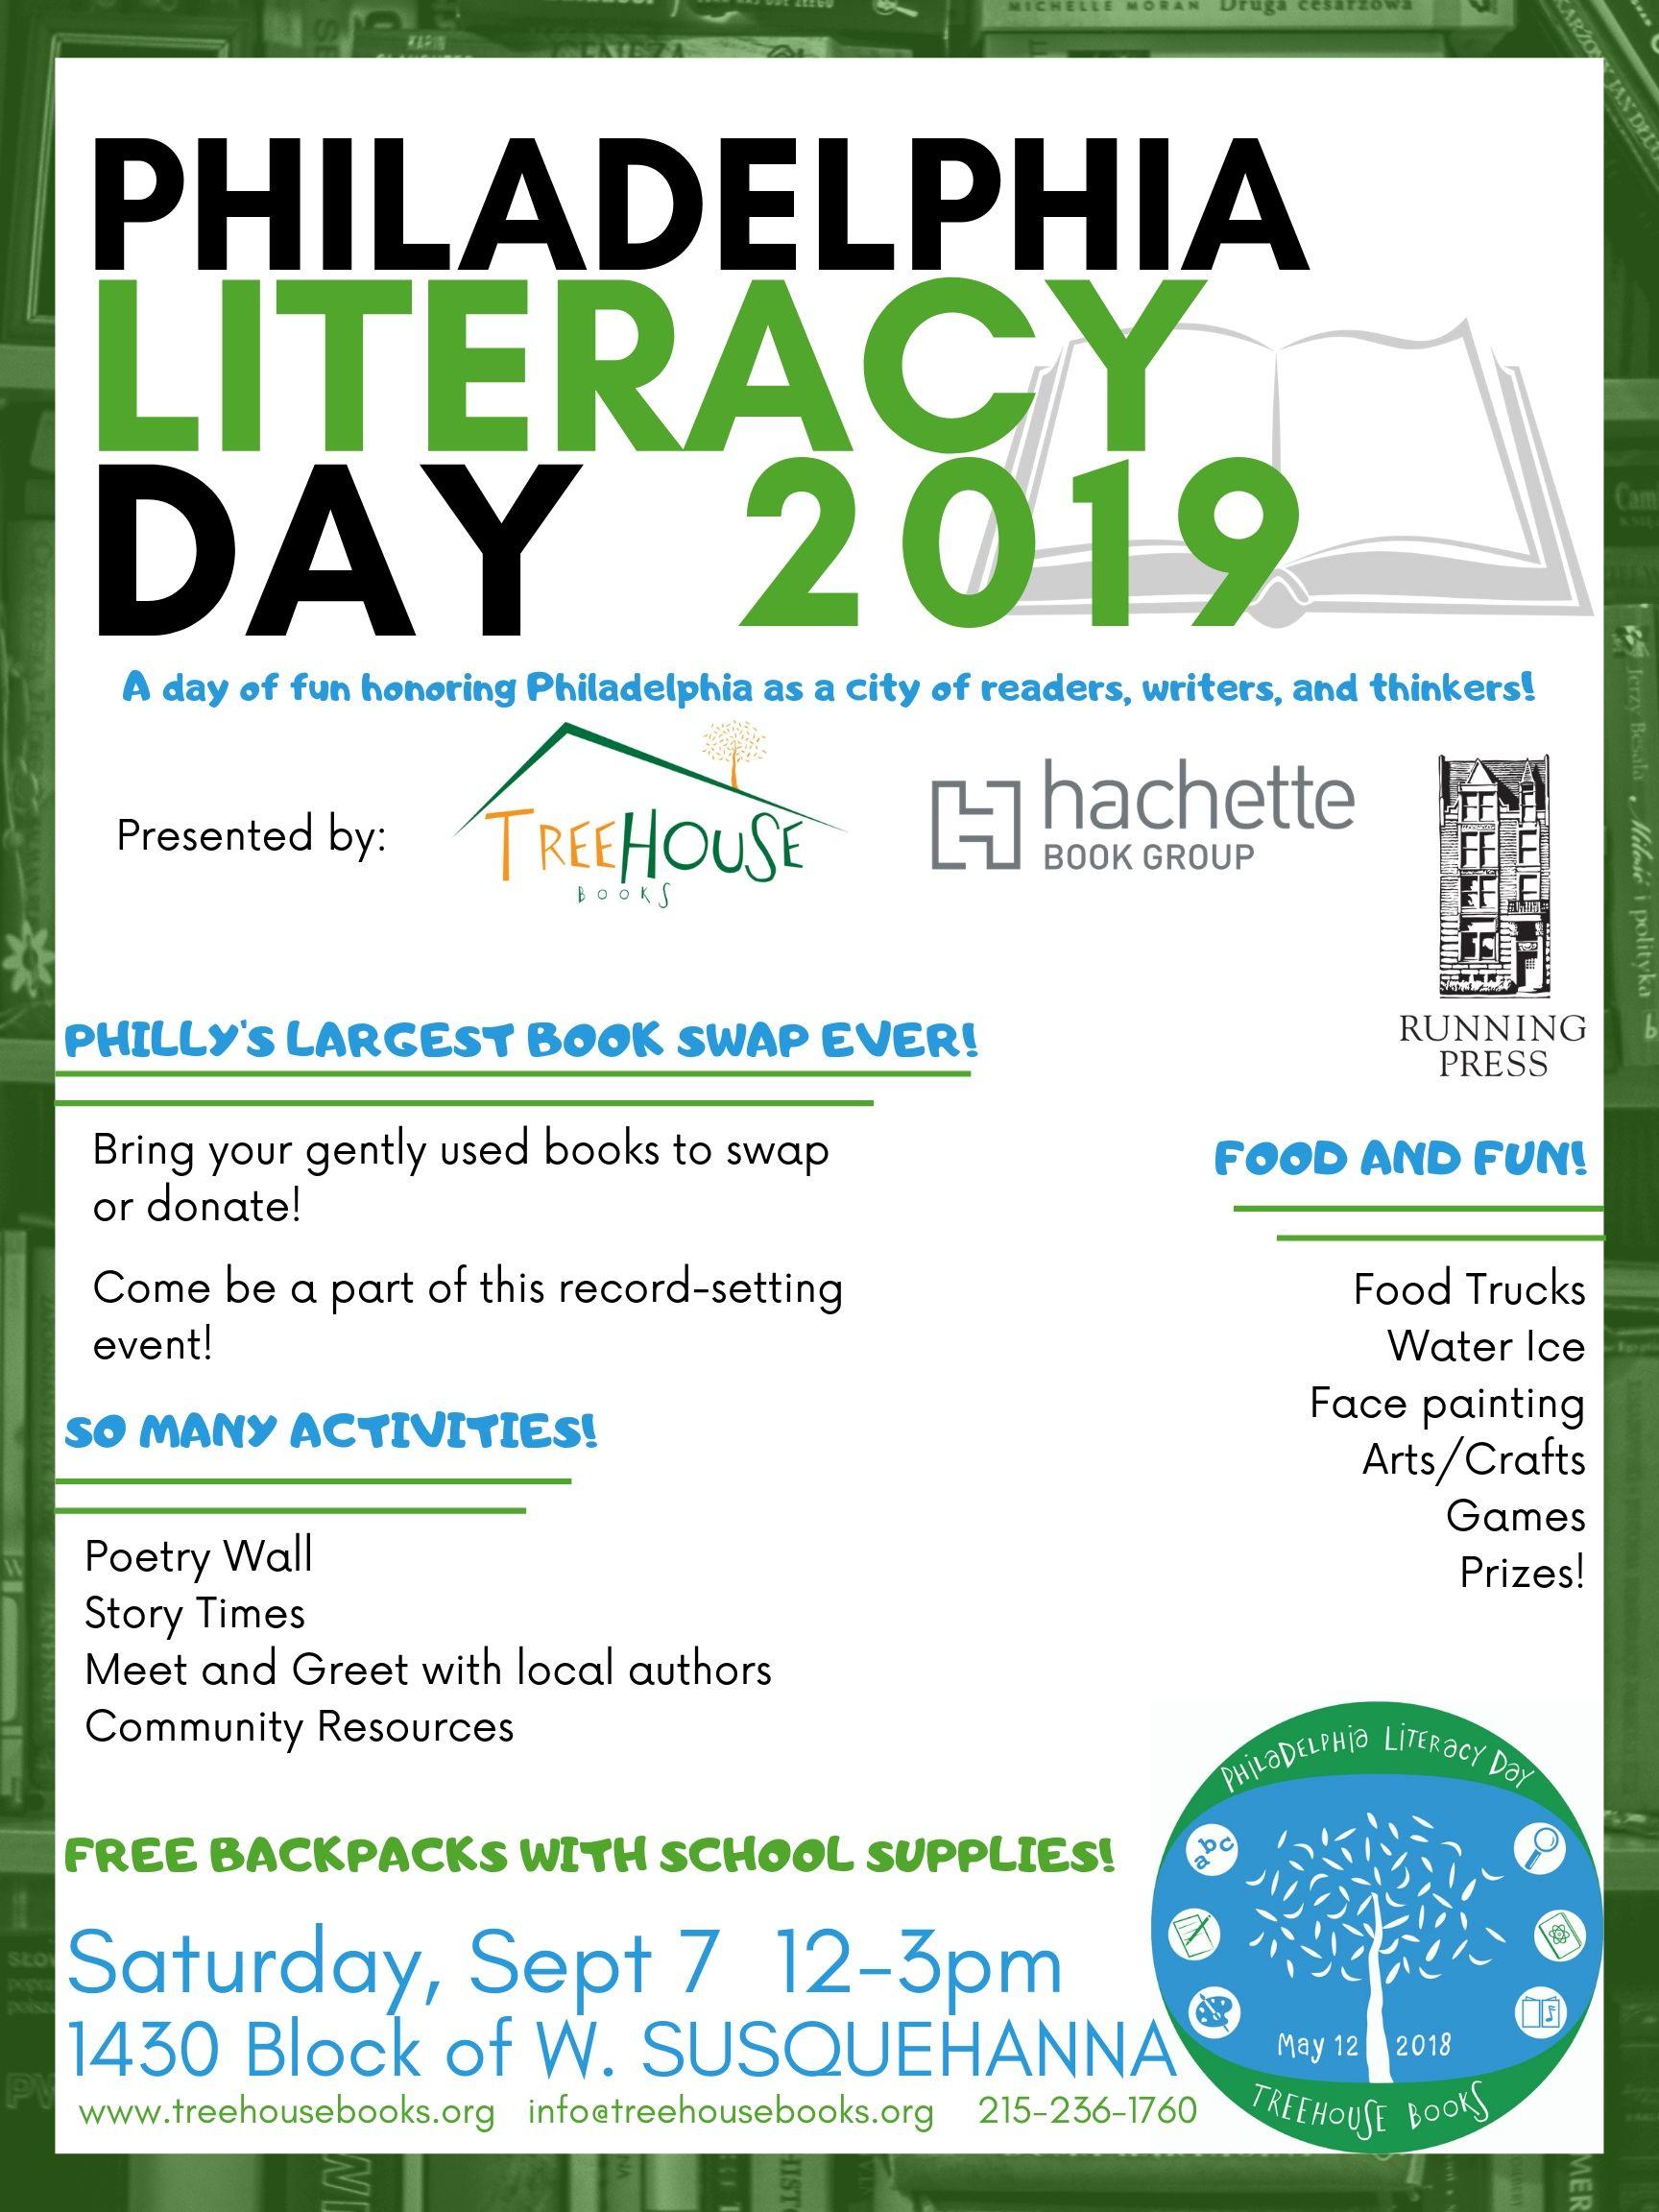 Philadelphia-Literacy-Day-2019.jpg